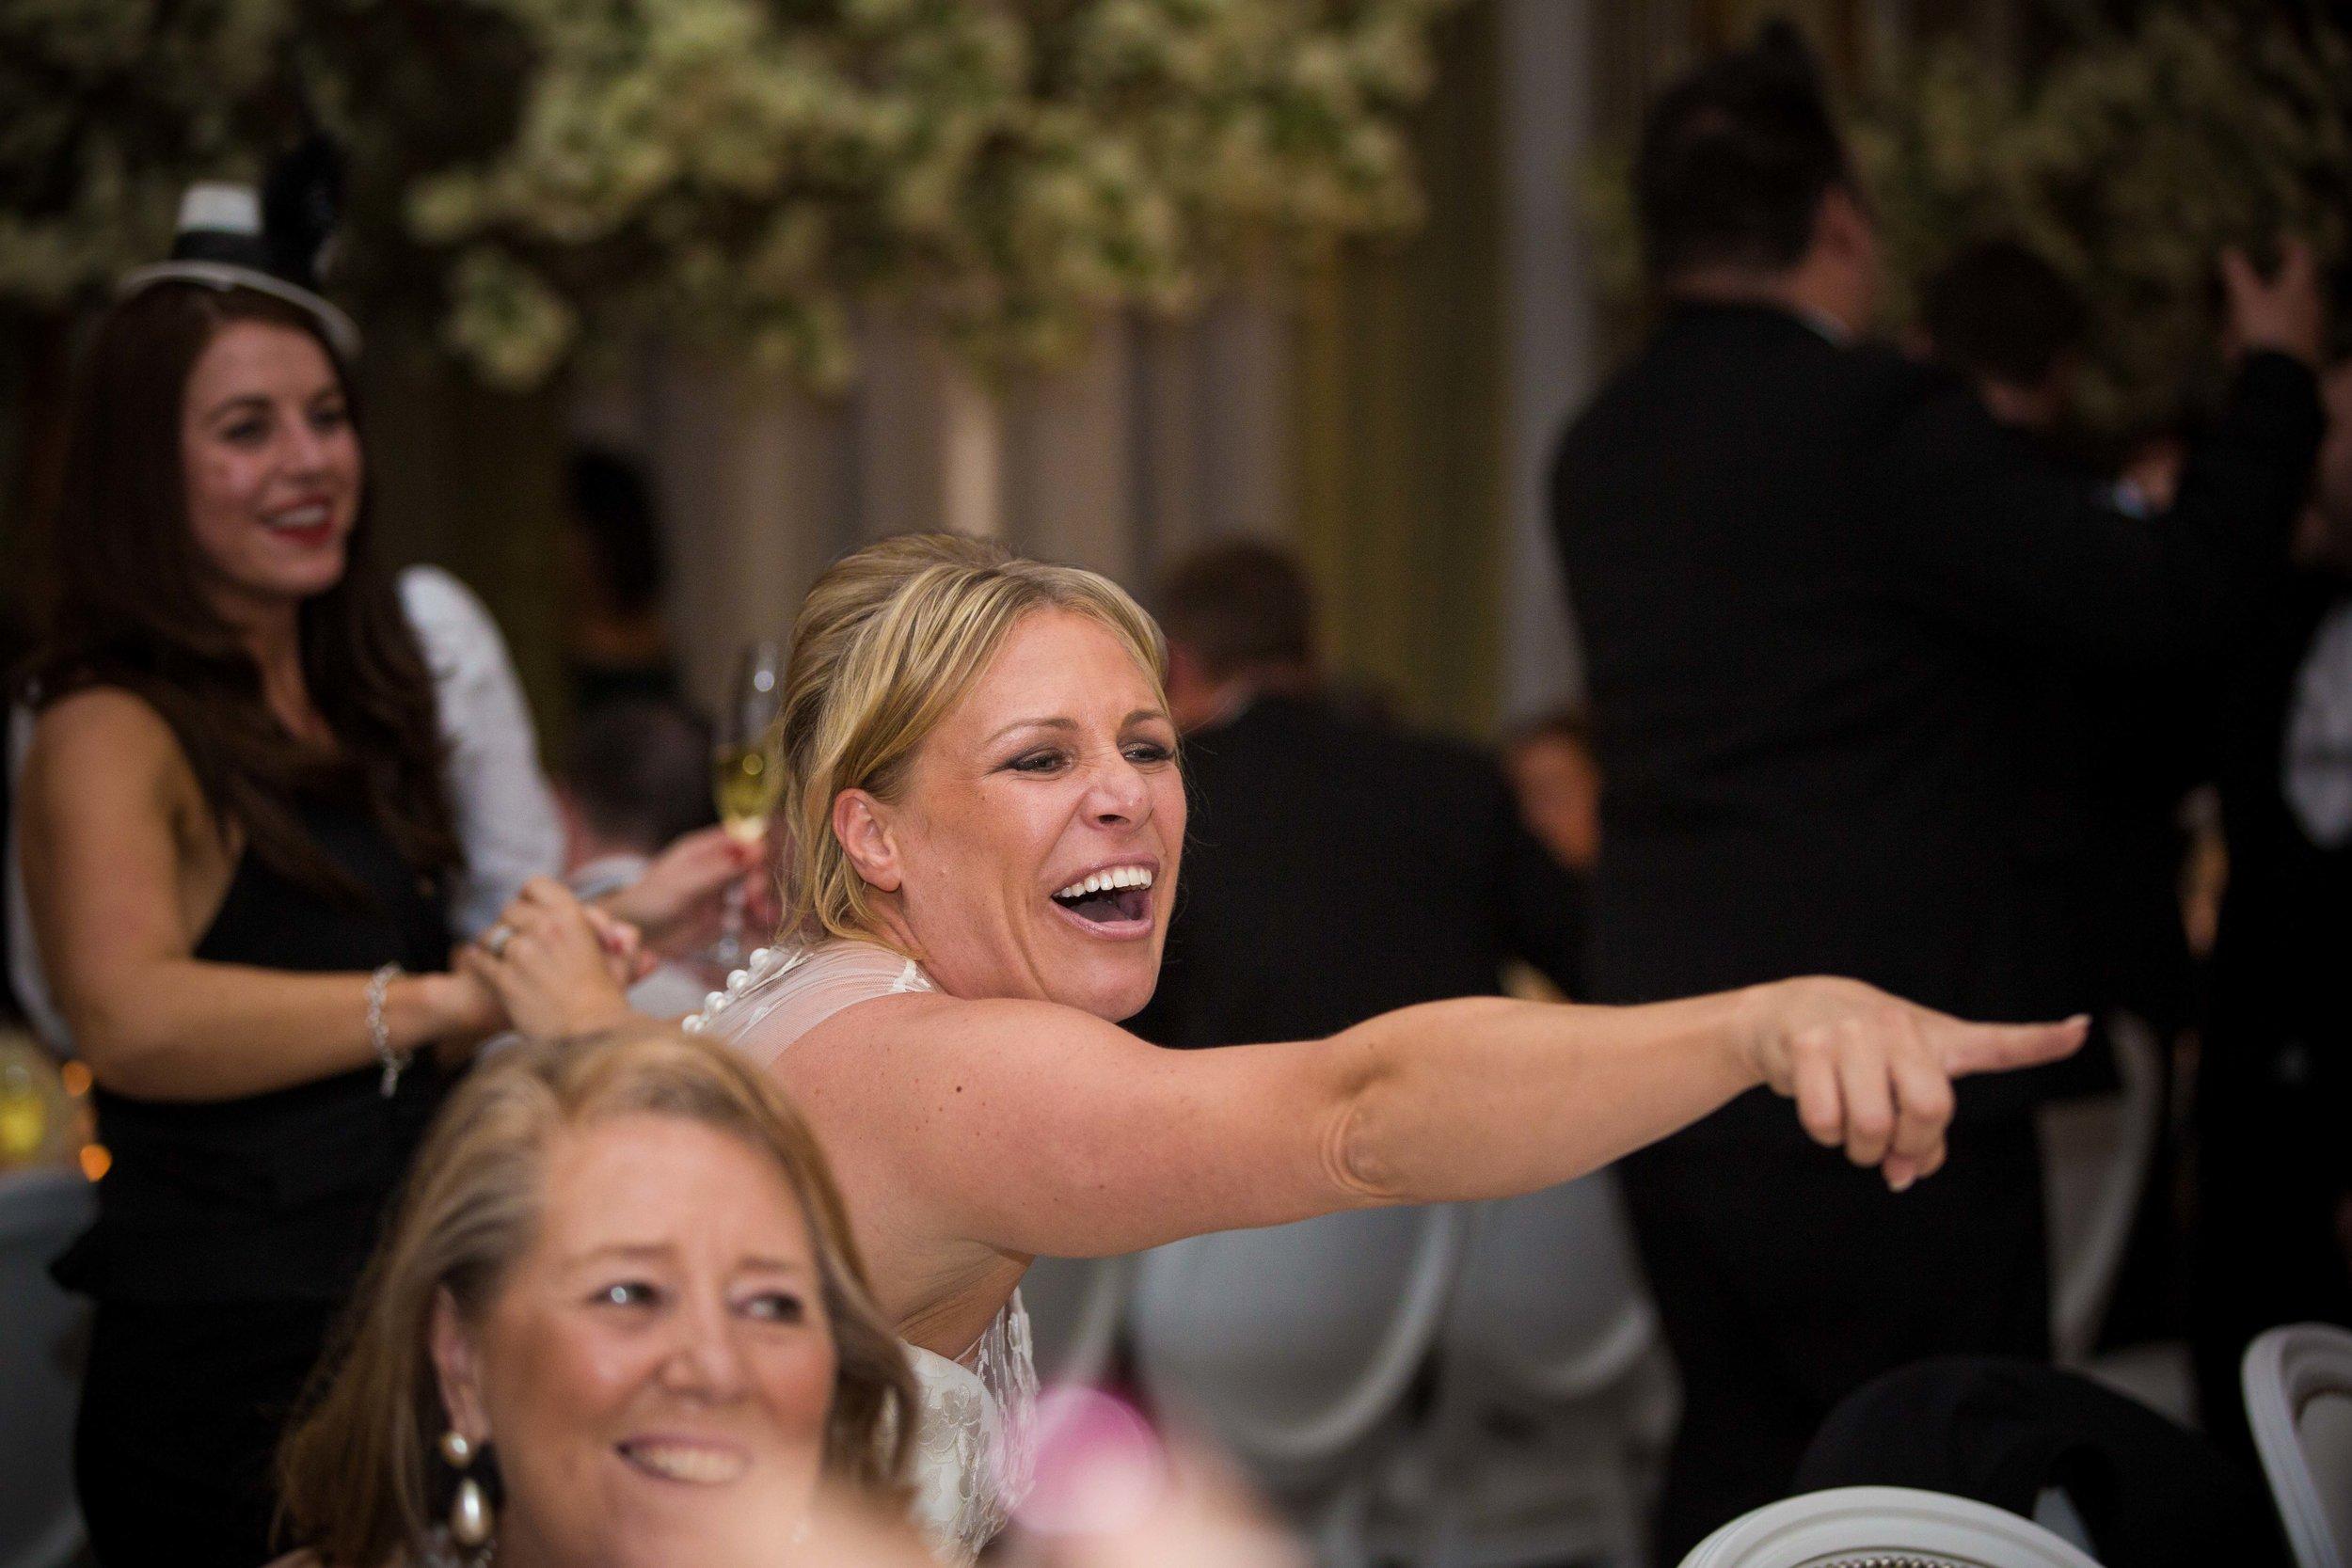 claridges-hotel-wedding-photographer-london-mayfair-natalia-smith-photography-139.jpg